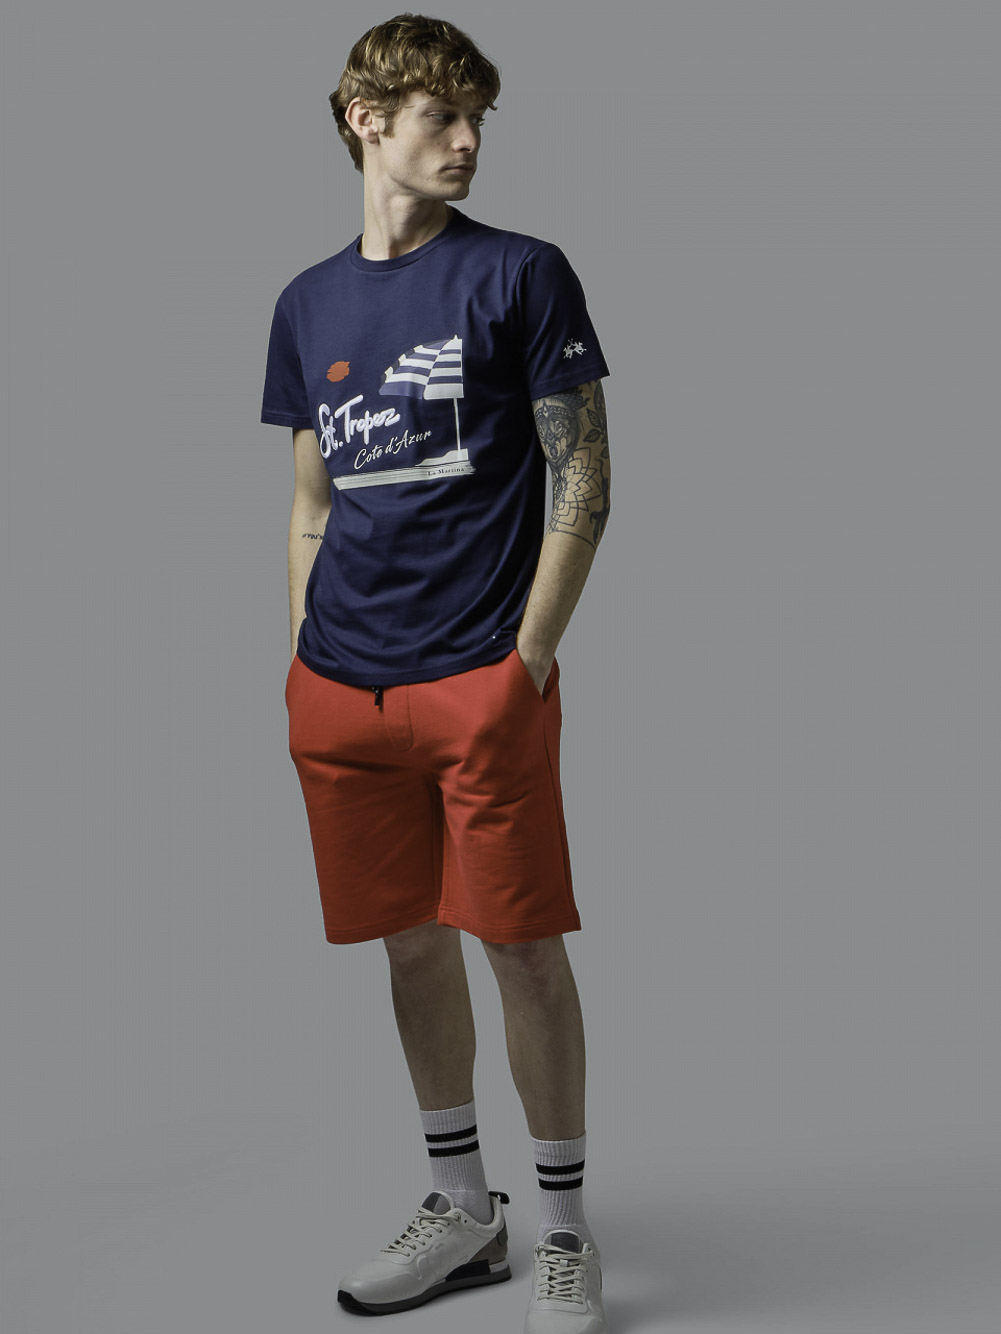 LA MARTINA Μπλούζα t-shirt 3LMRMR314-7017 ΜΠΛΕ